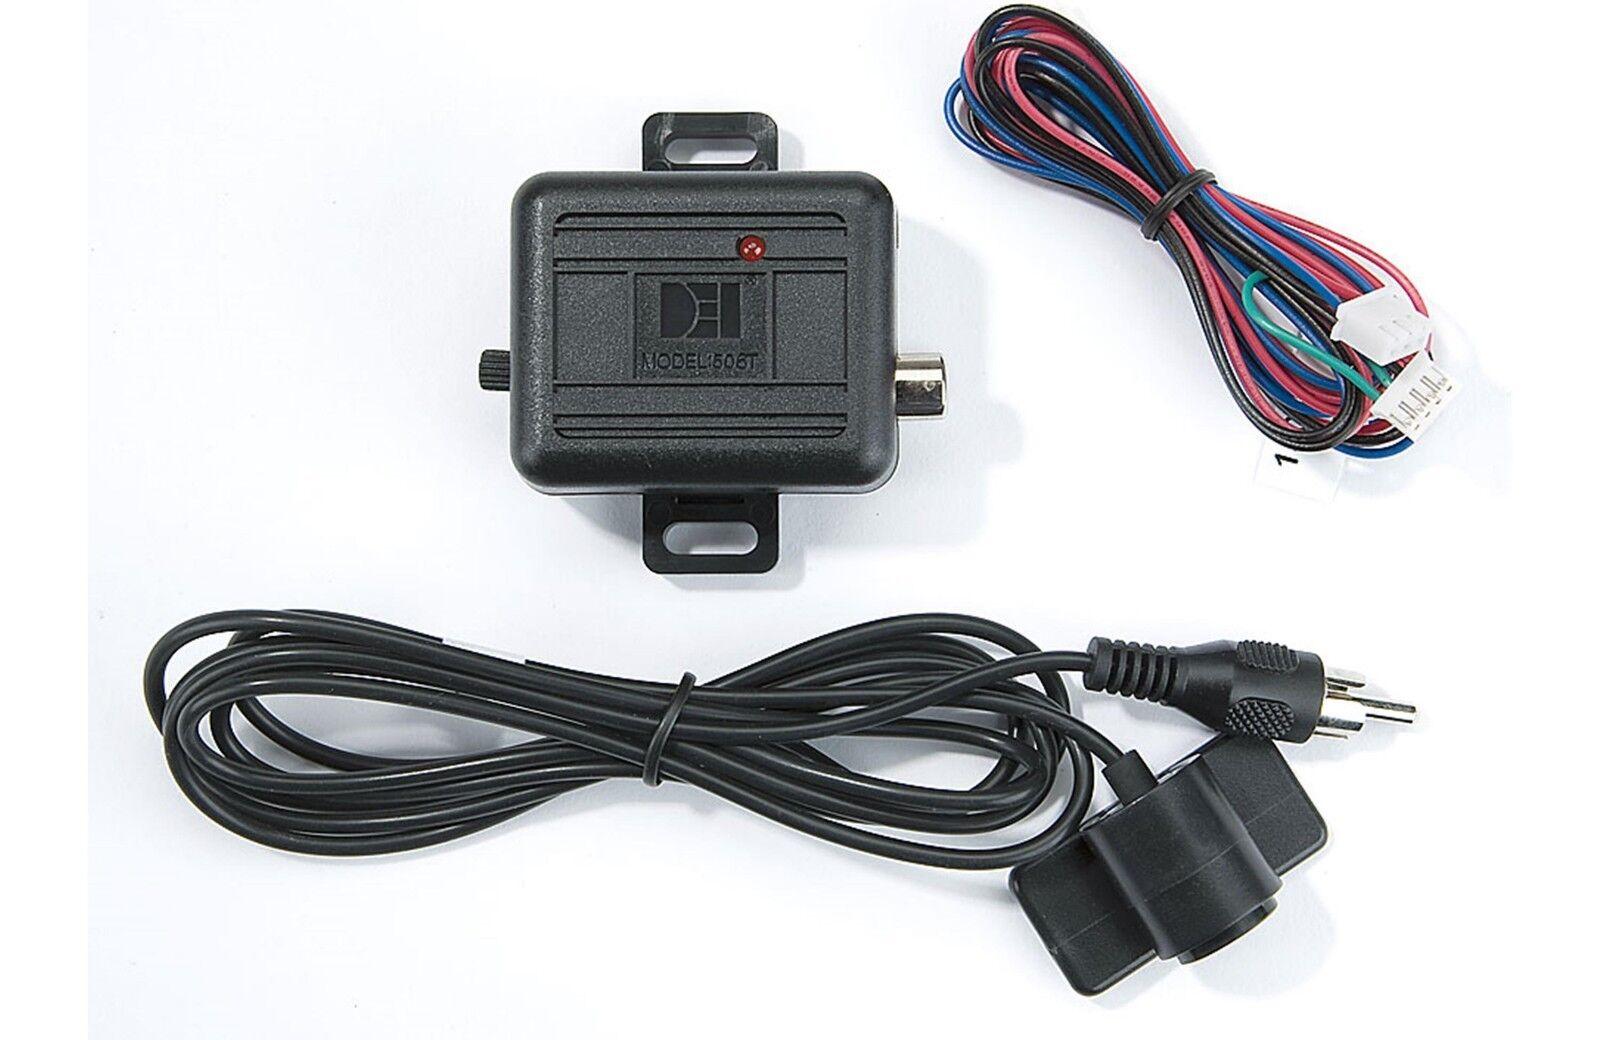 Directed Audio Glass Break Sensor